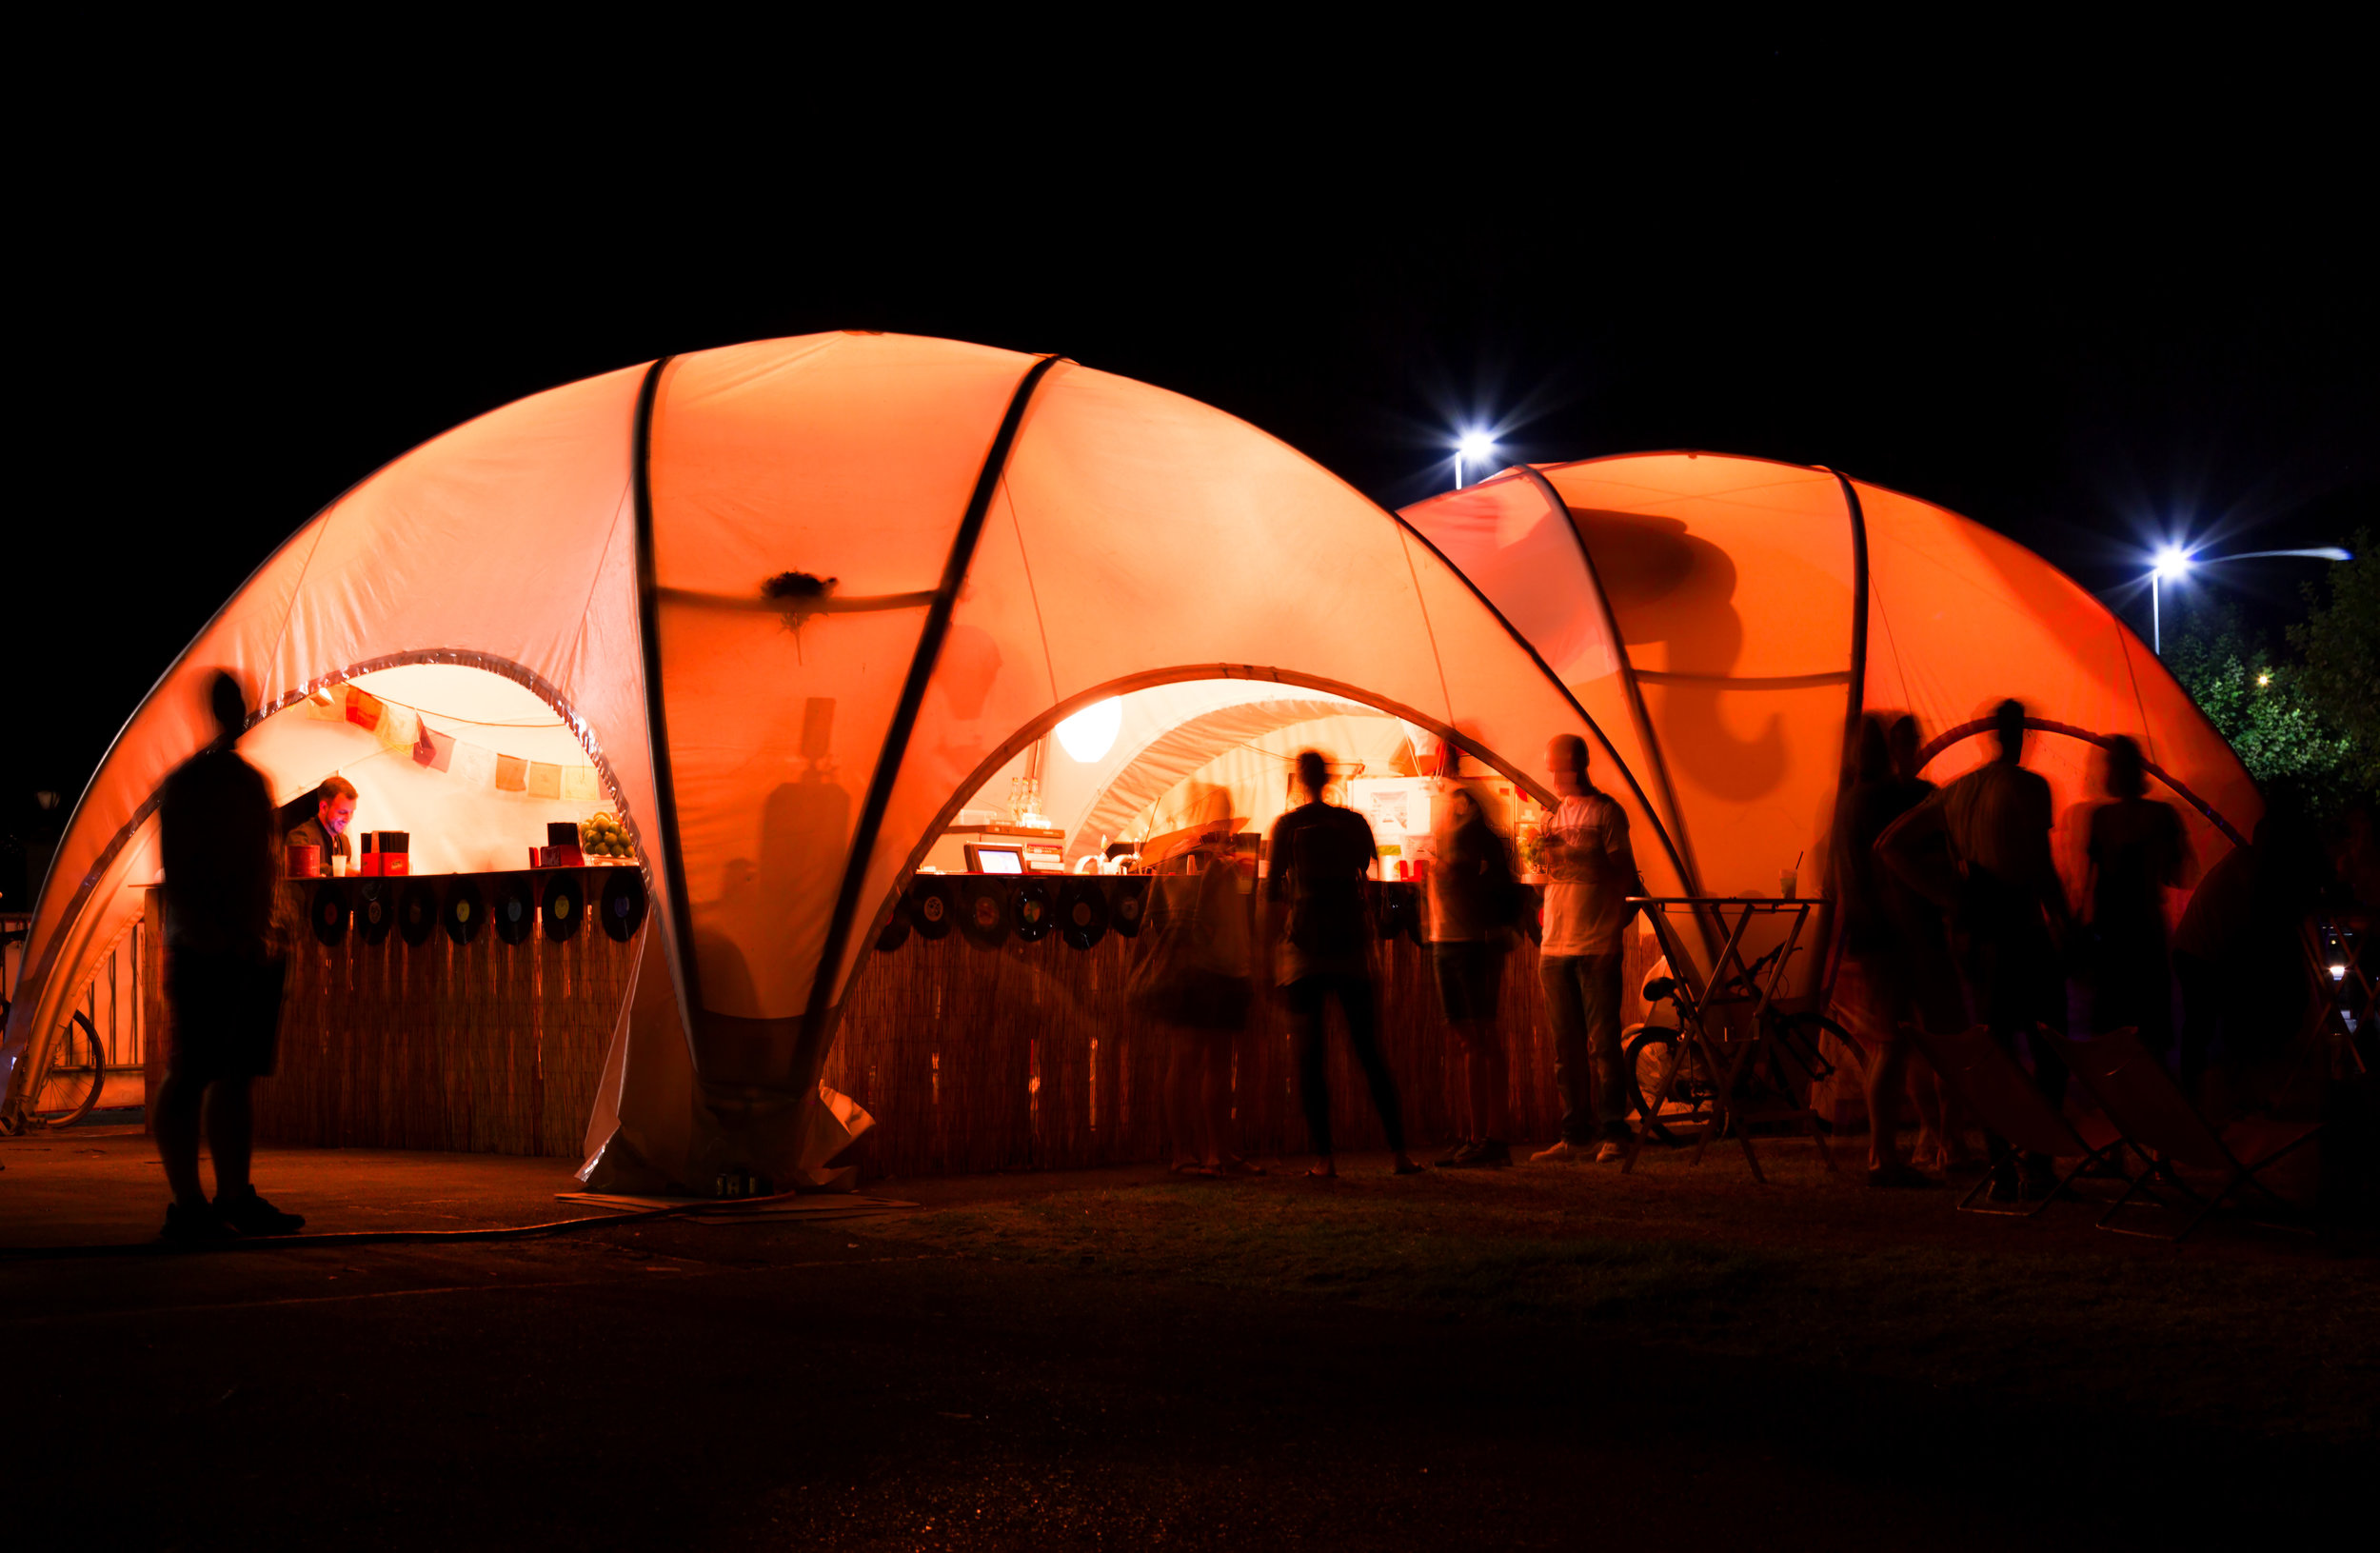 Geneva tents-5259 JPG.jpg